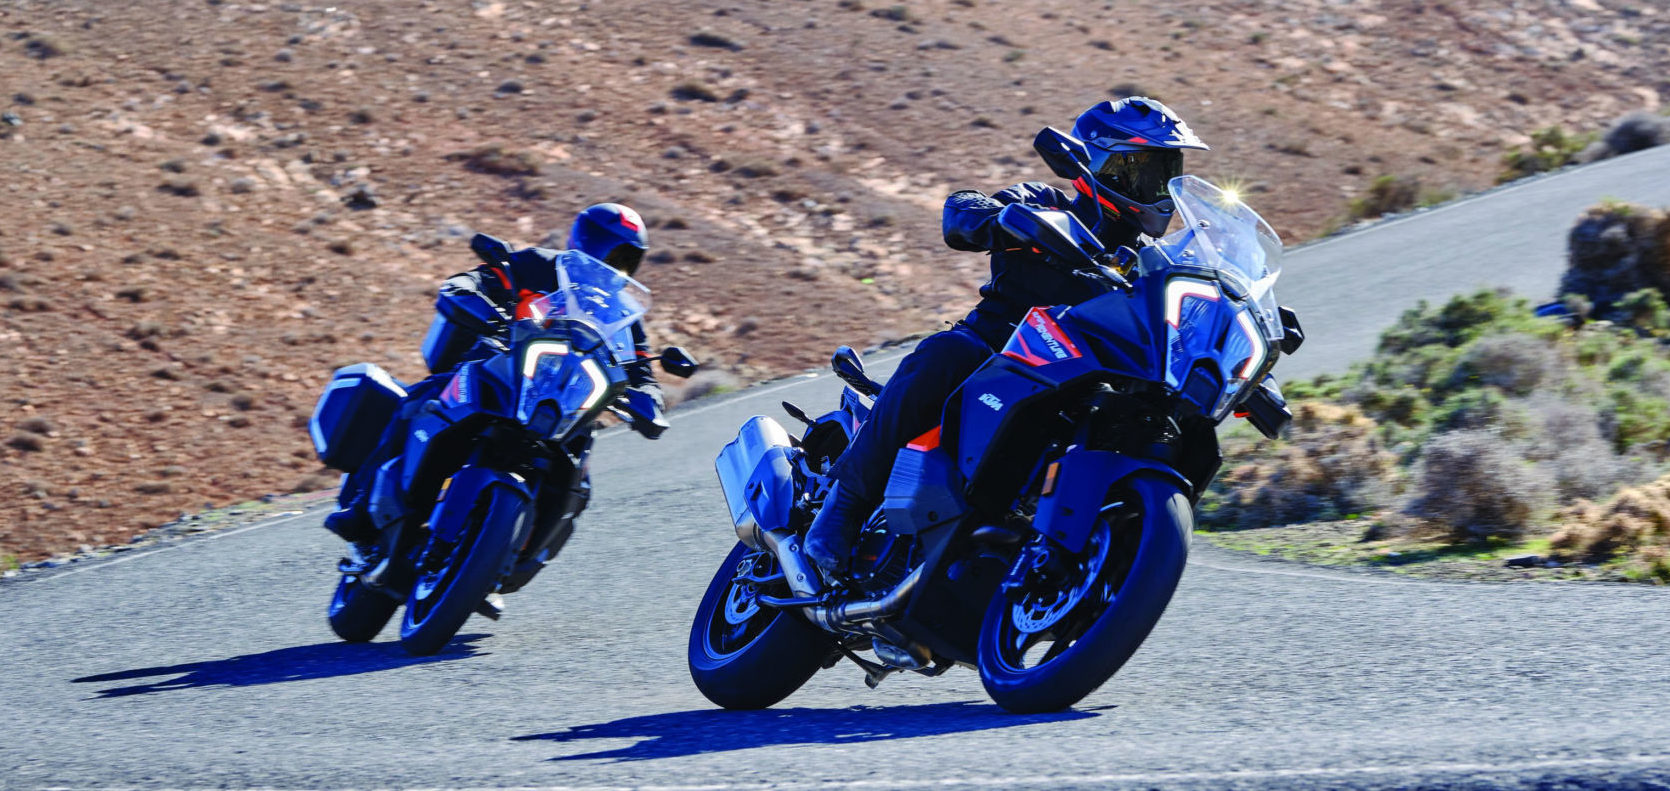 2021-model KTM 1290 Super Adventure S motorcycles in action. Photo courtesy KTM.